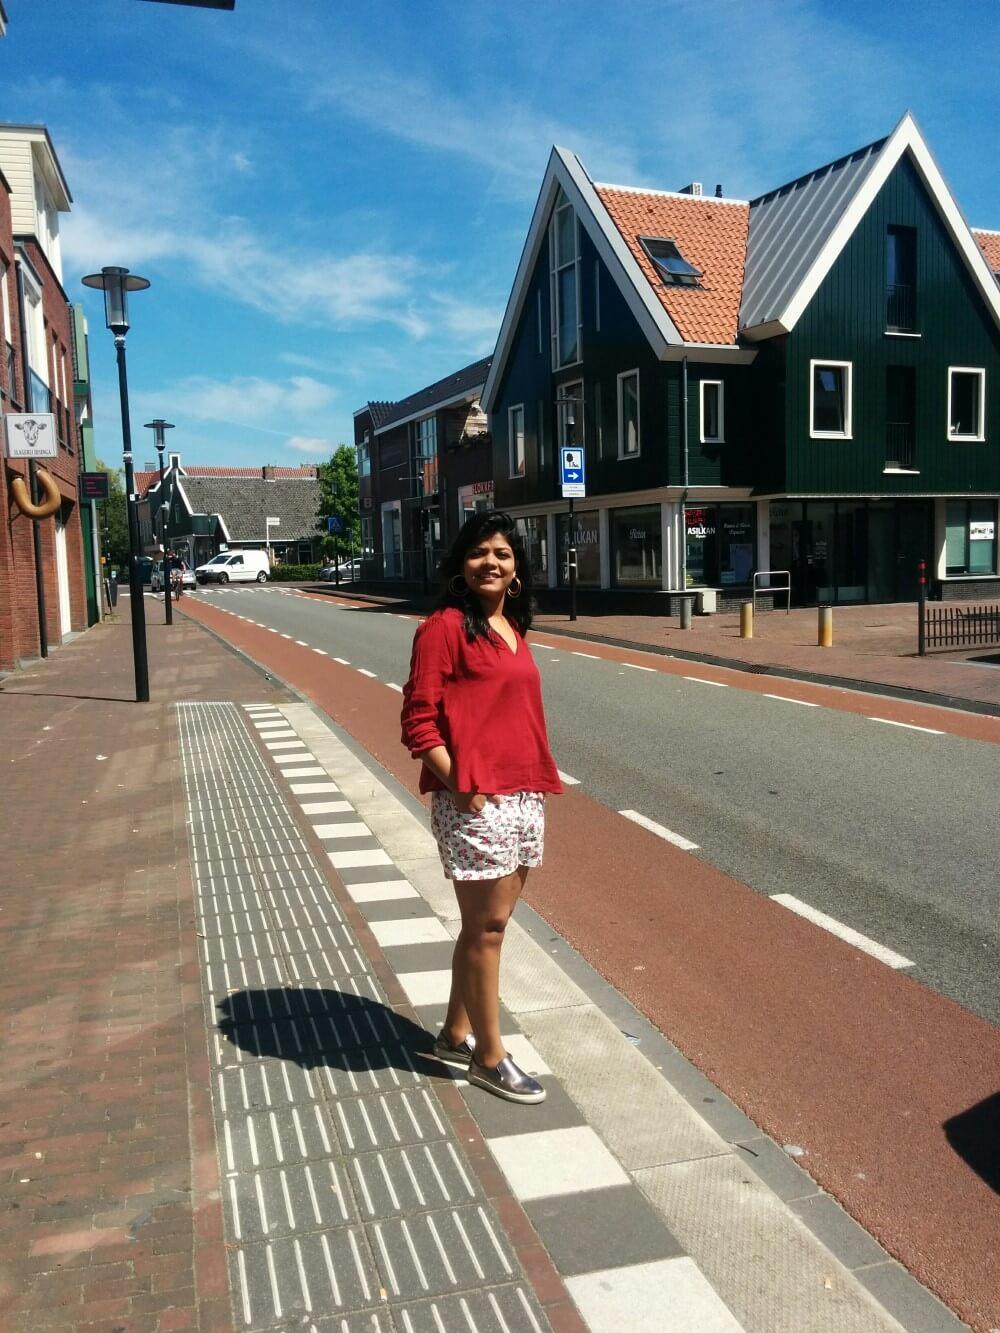 amsterdam-travelpeppy-photo-journey